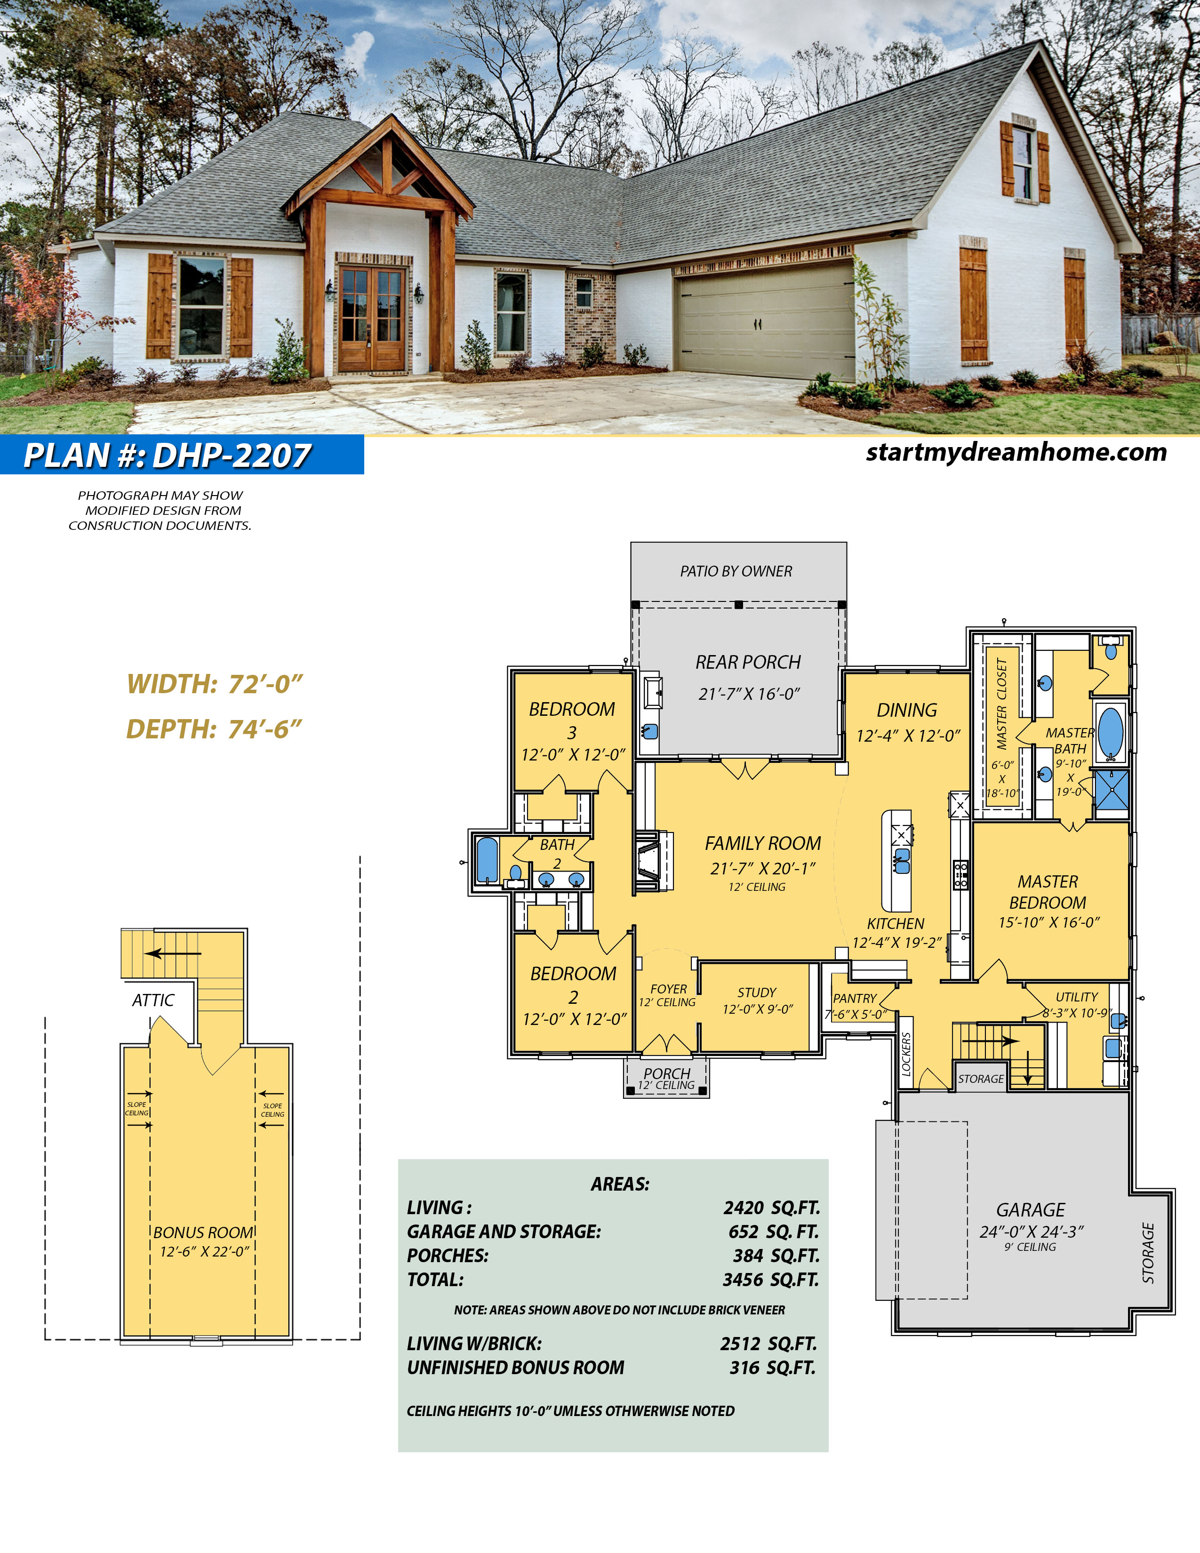 Dream Home Plan 2207 - Start My Dream Home